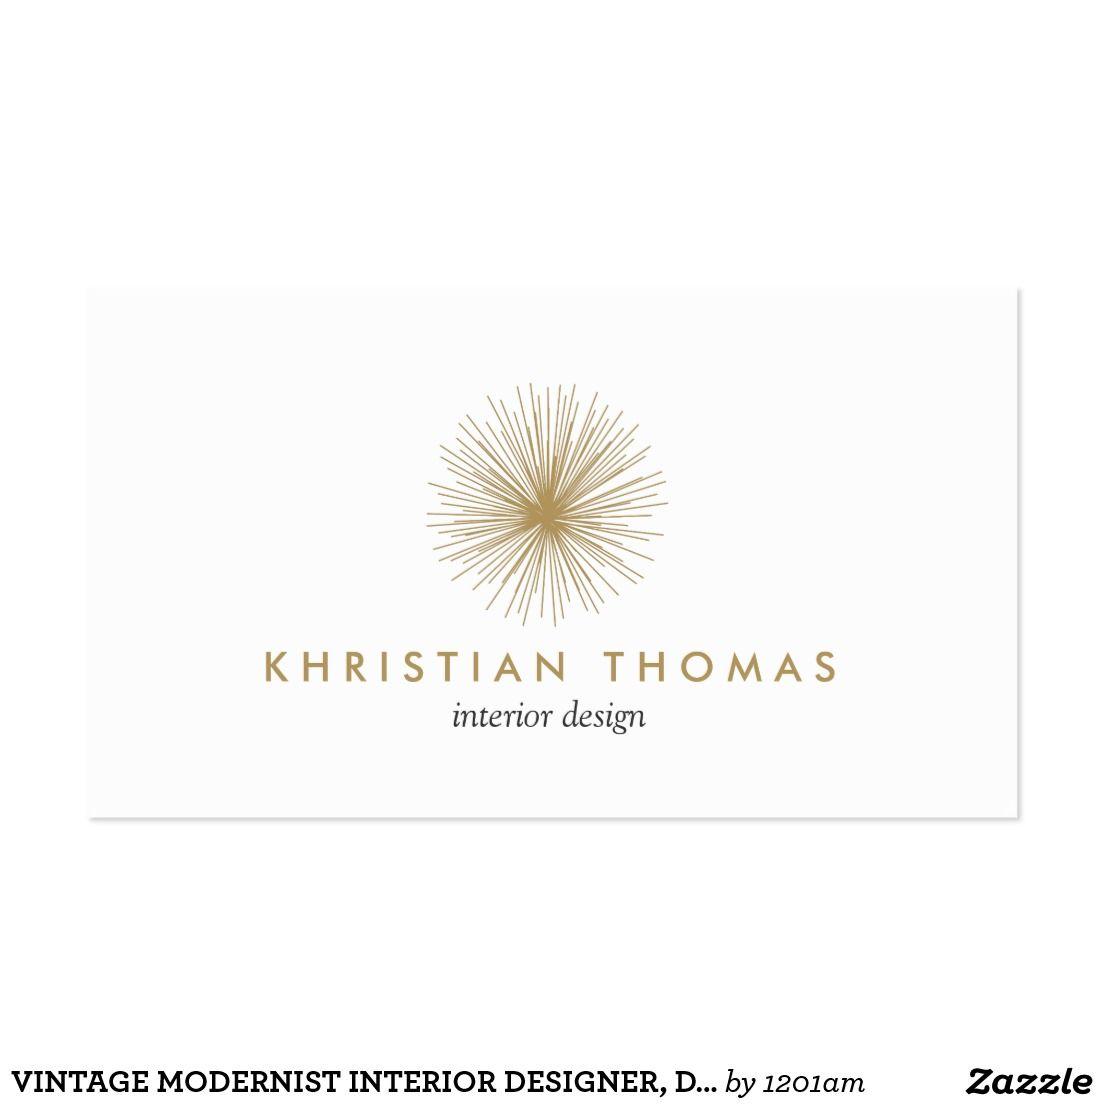 Profile Card Business Cards Interior Designer Pinterest